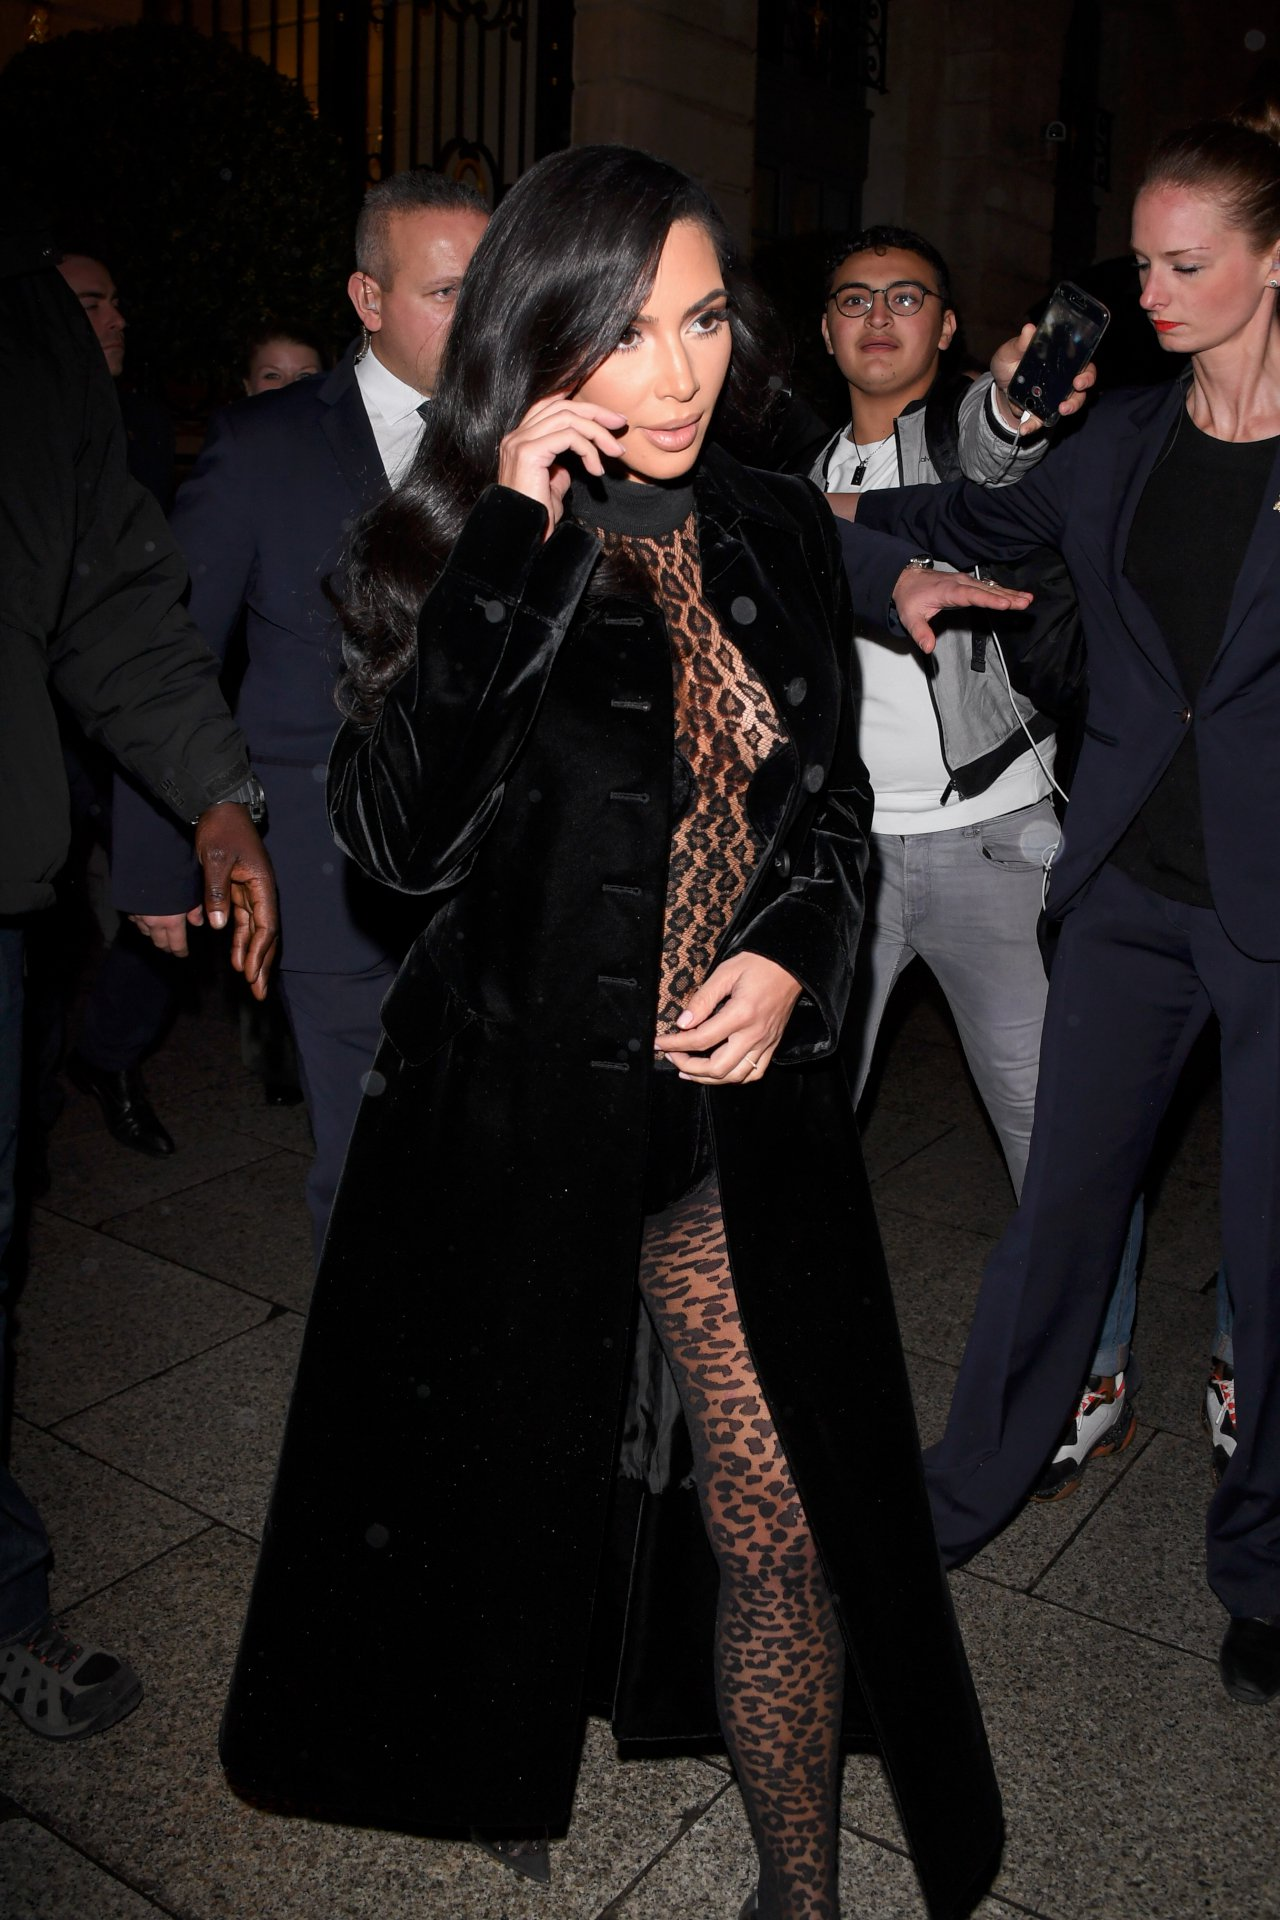 Kim Kardashian Hot In Skimpy Outfit